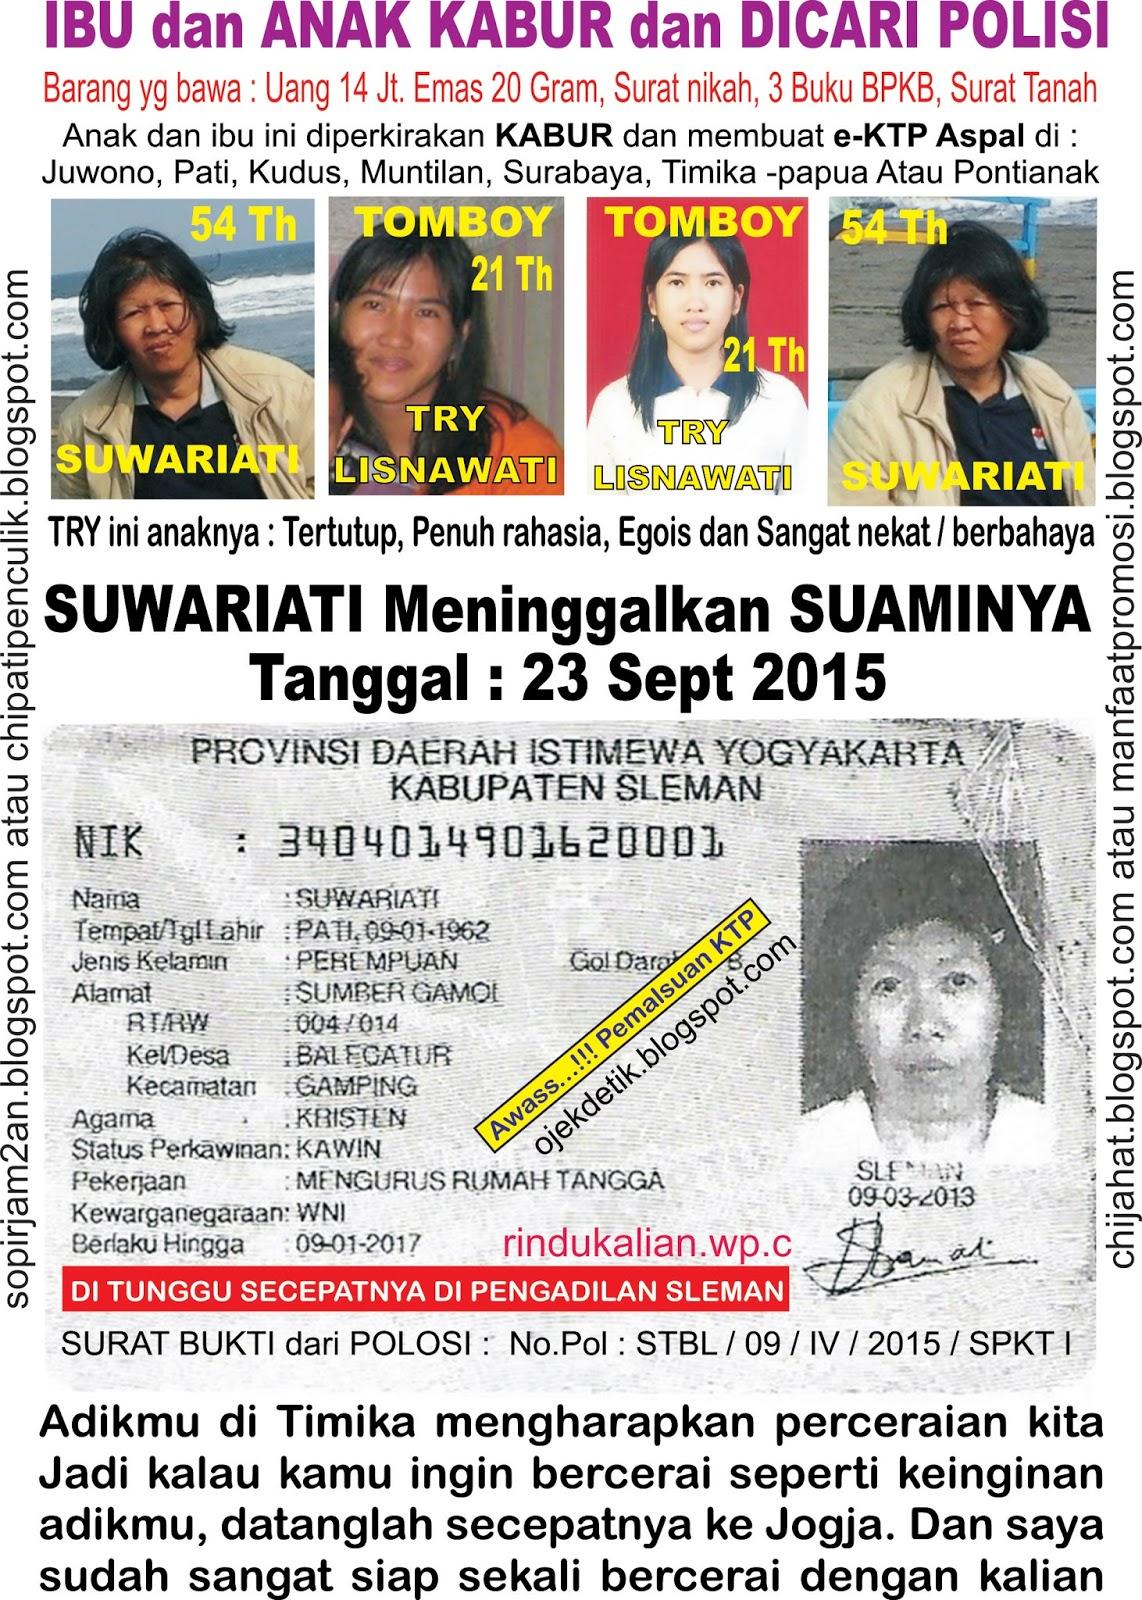 Harga Atap Baja Ringan Yogyakarta Tour And Travel, Jual Tiket Promo, Jasa Antar Jemput ...